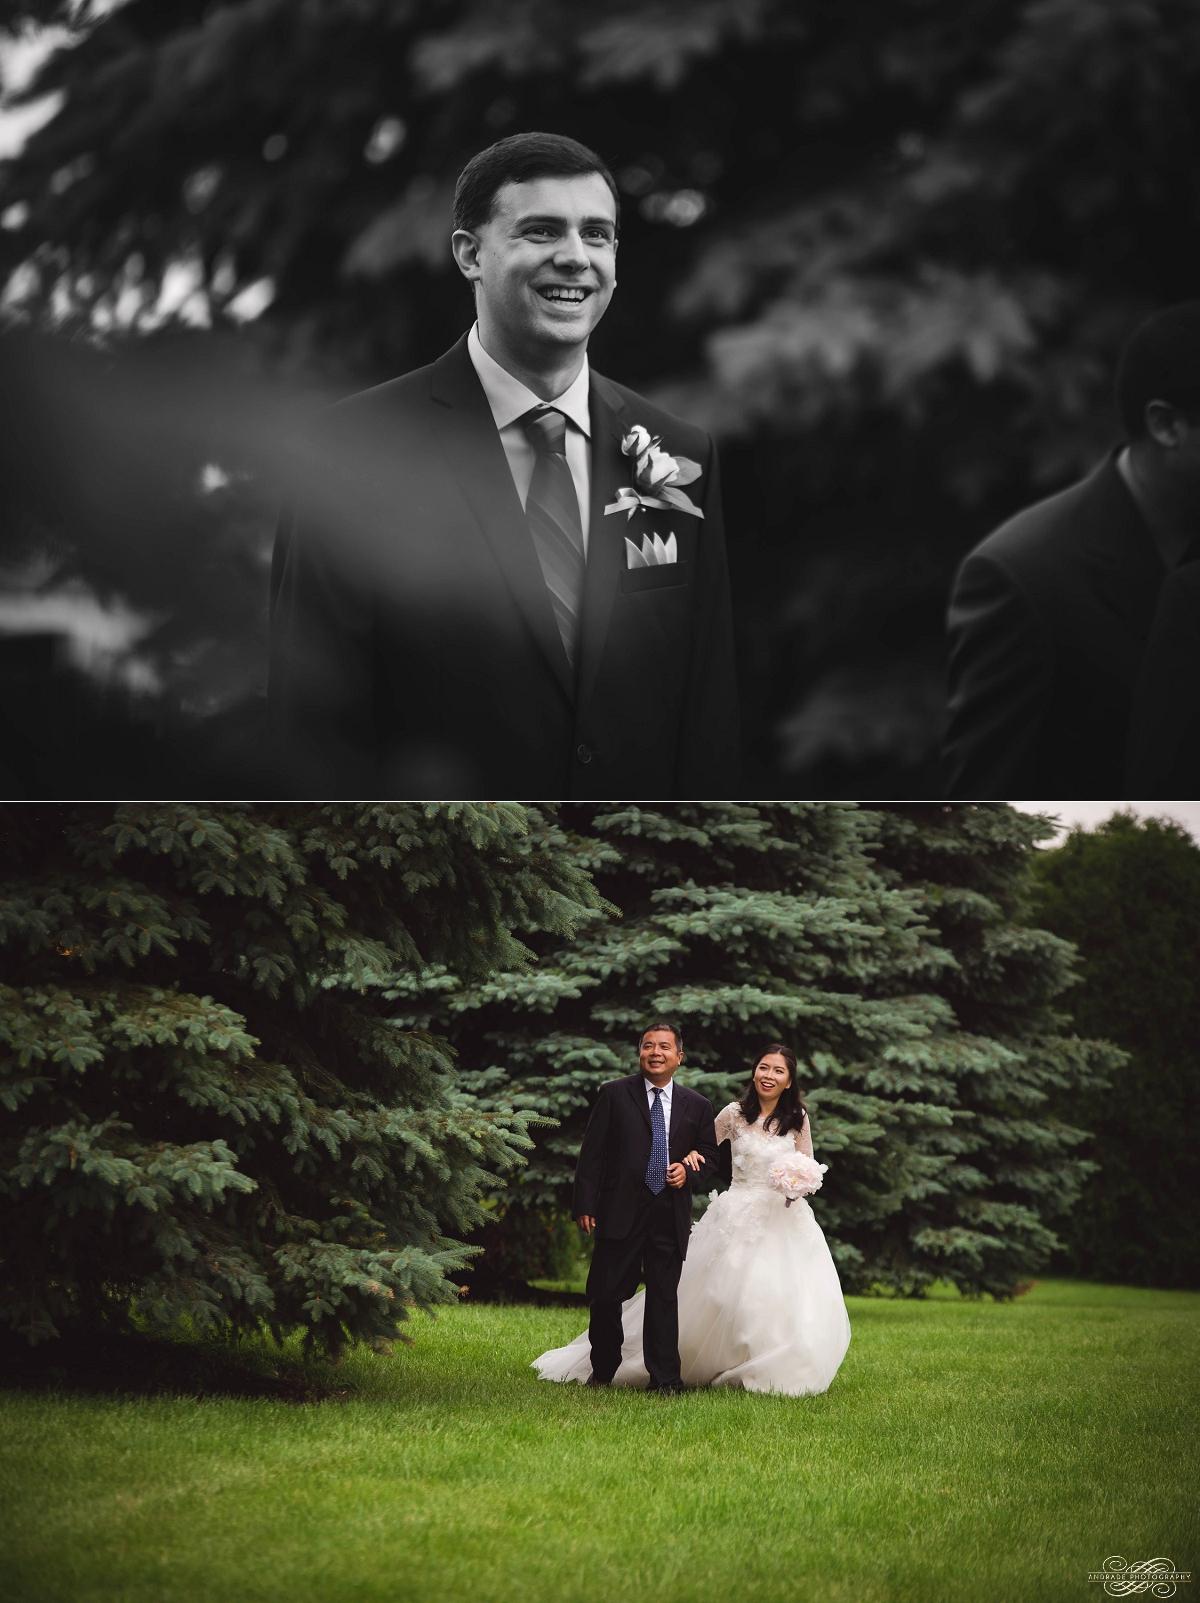 Lindsey + Eric Alpine Banquets Darien Illinois Wedding Photography_0023.jpg